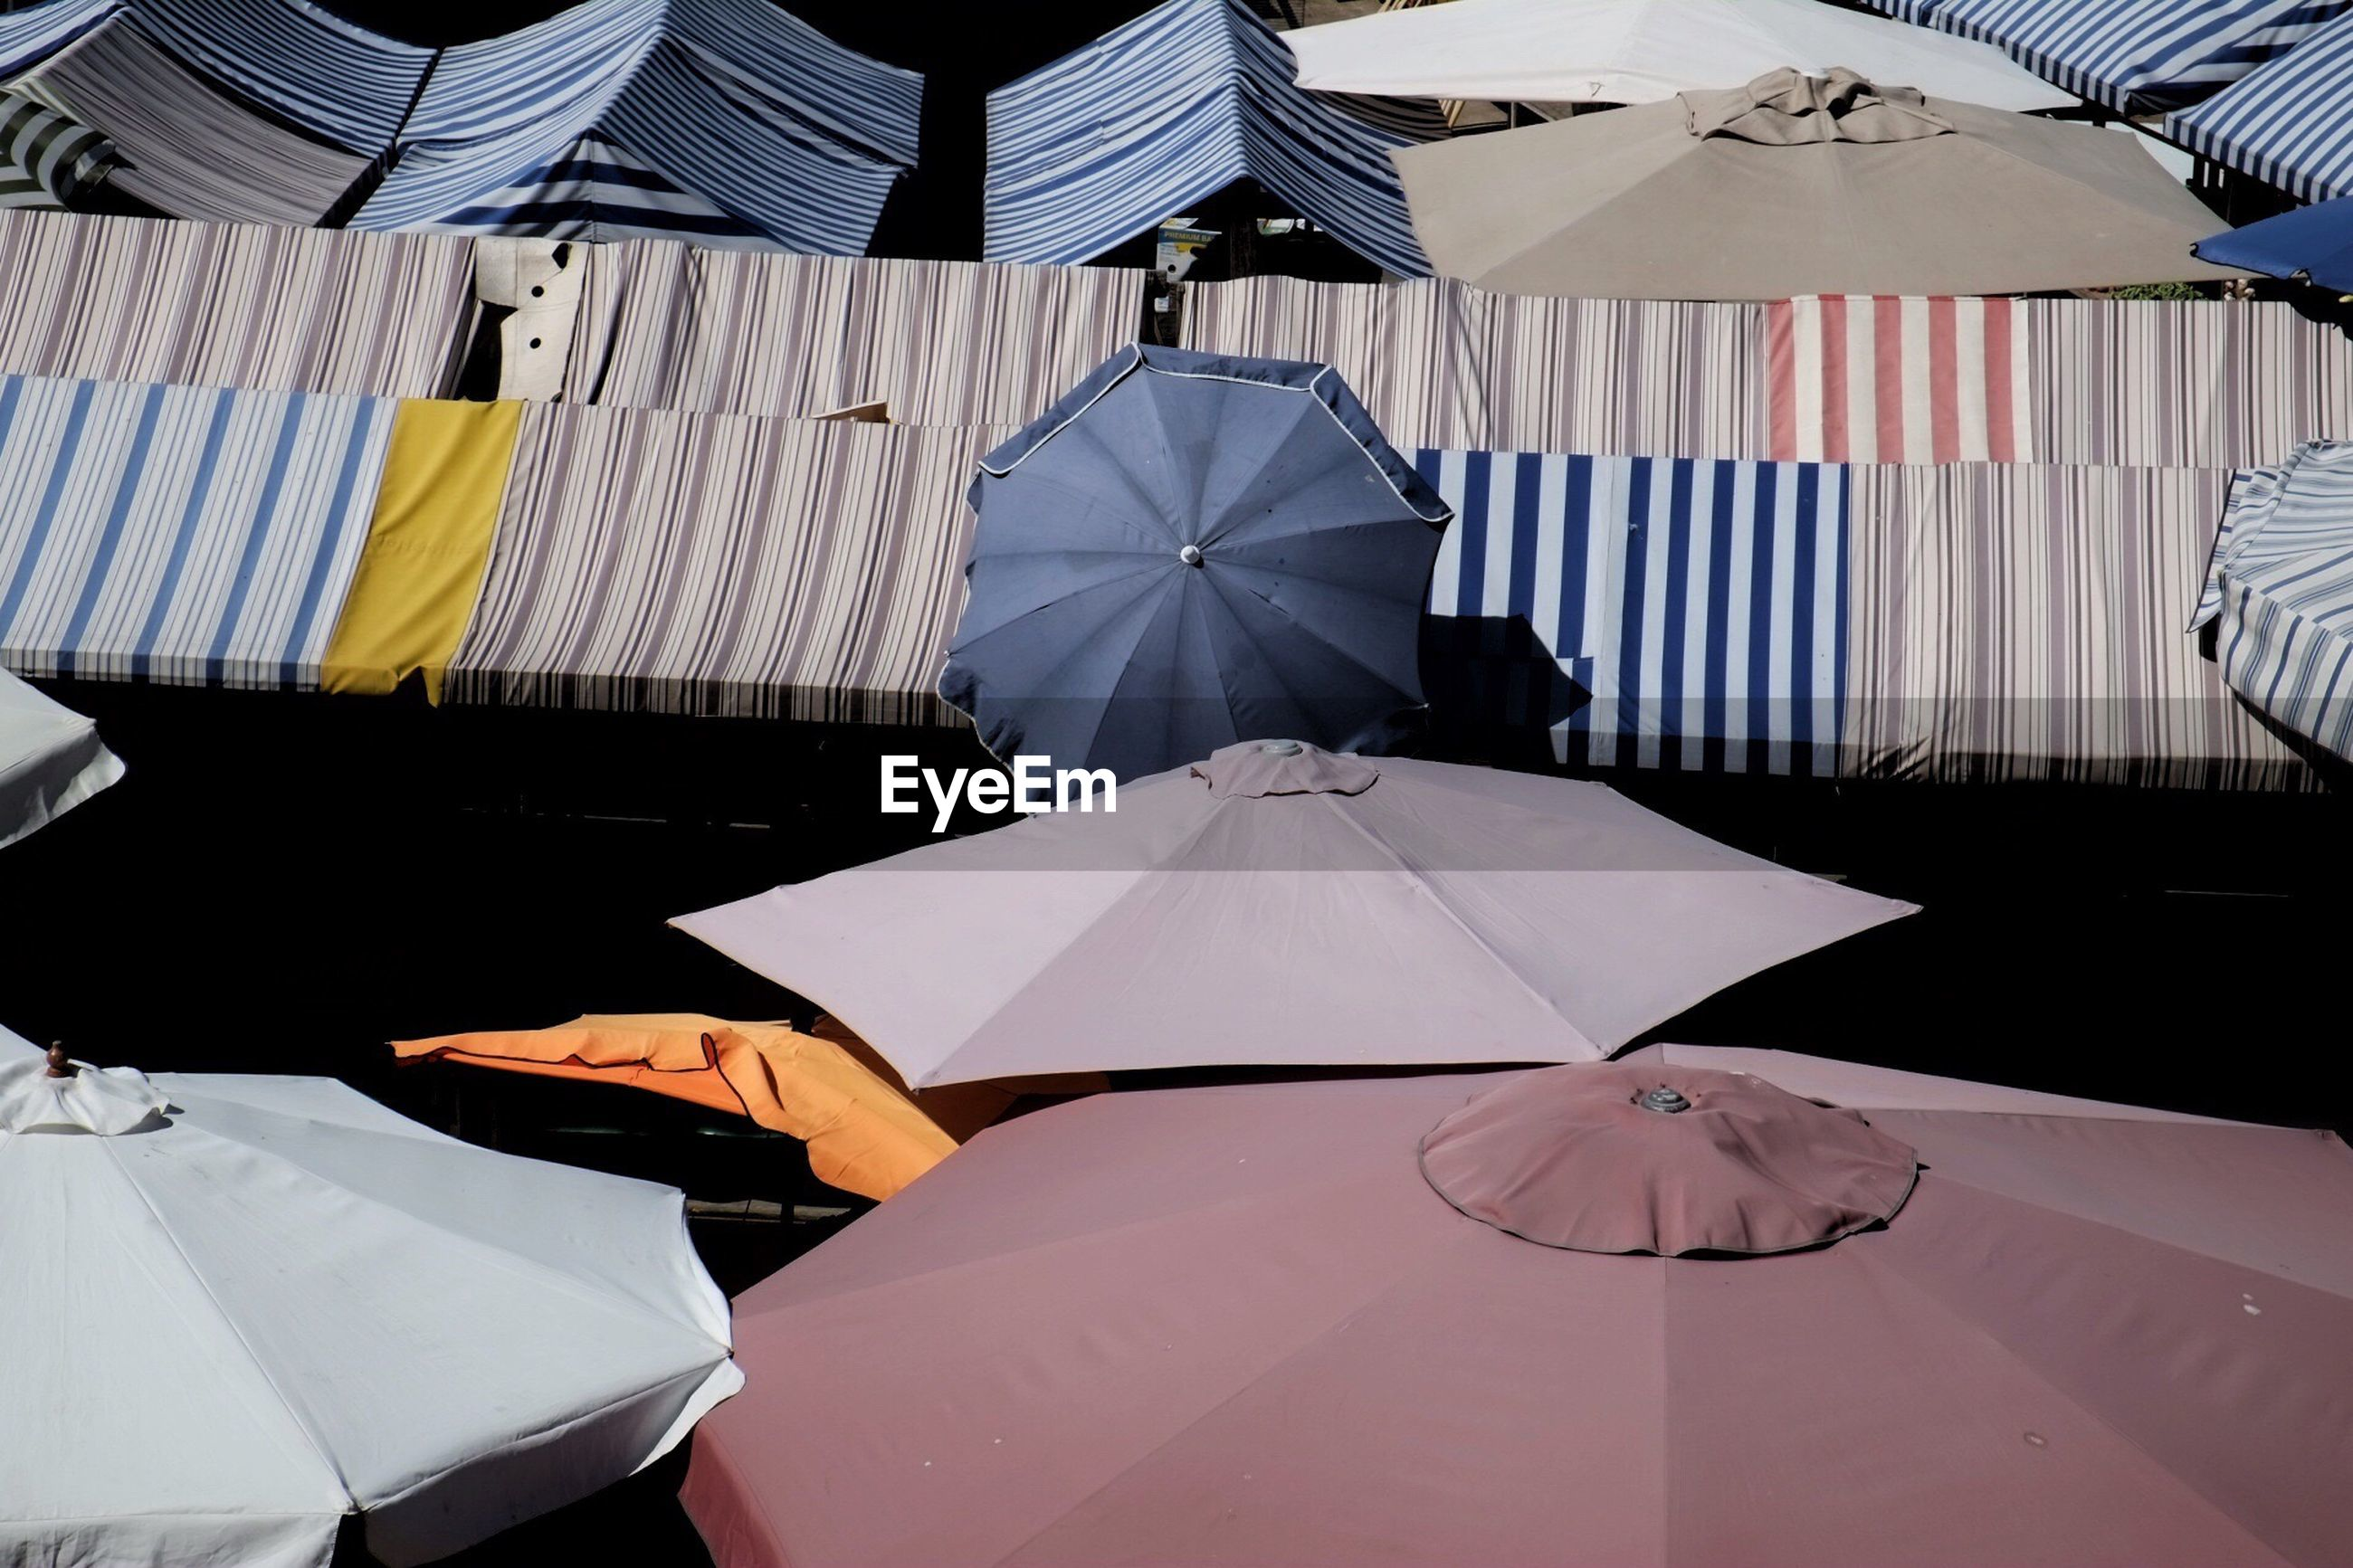 High angle view of umbrellas